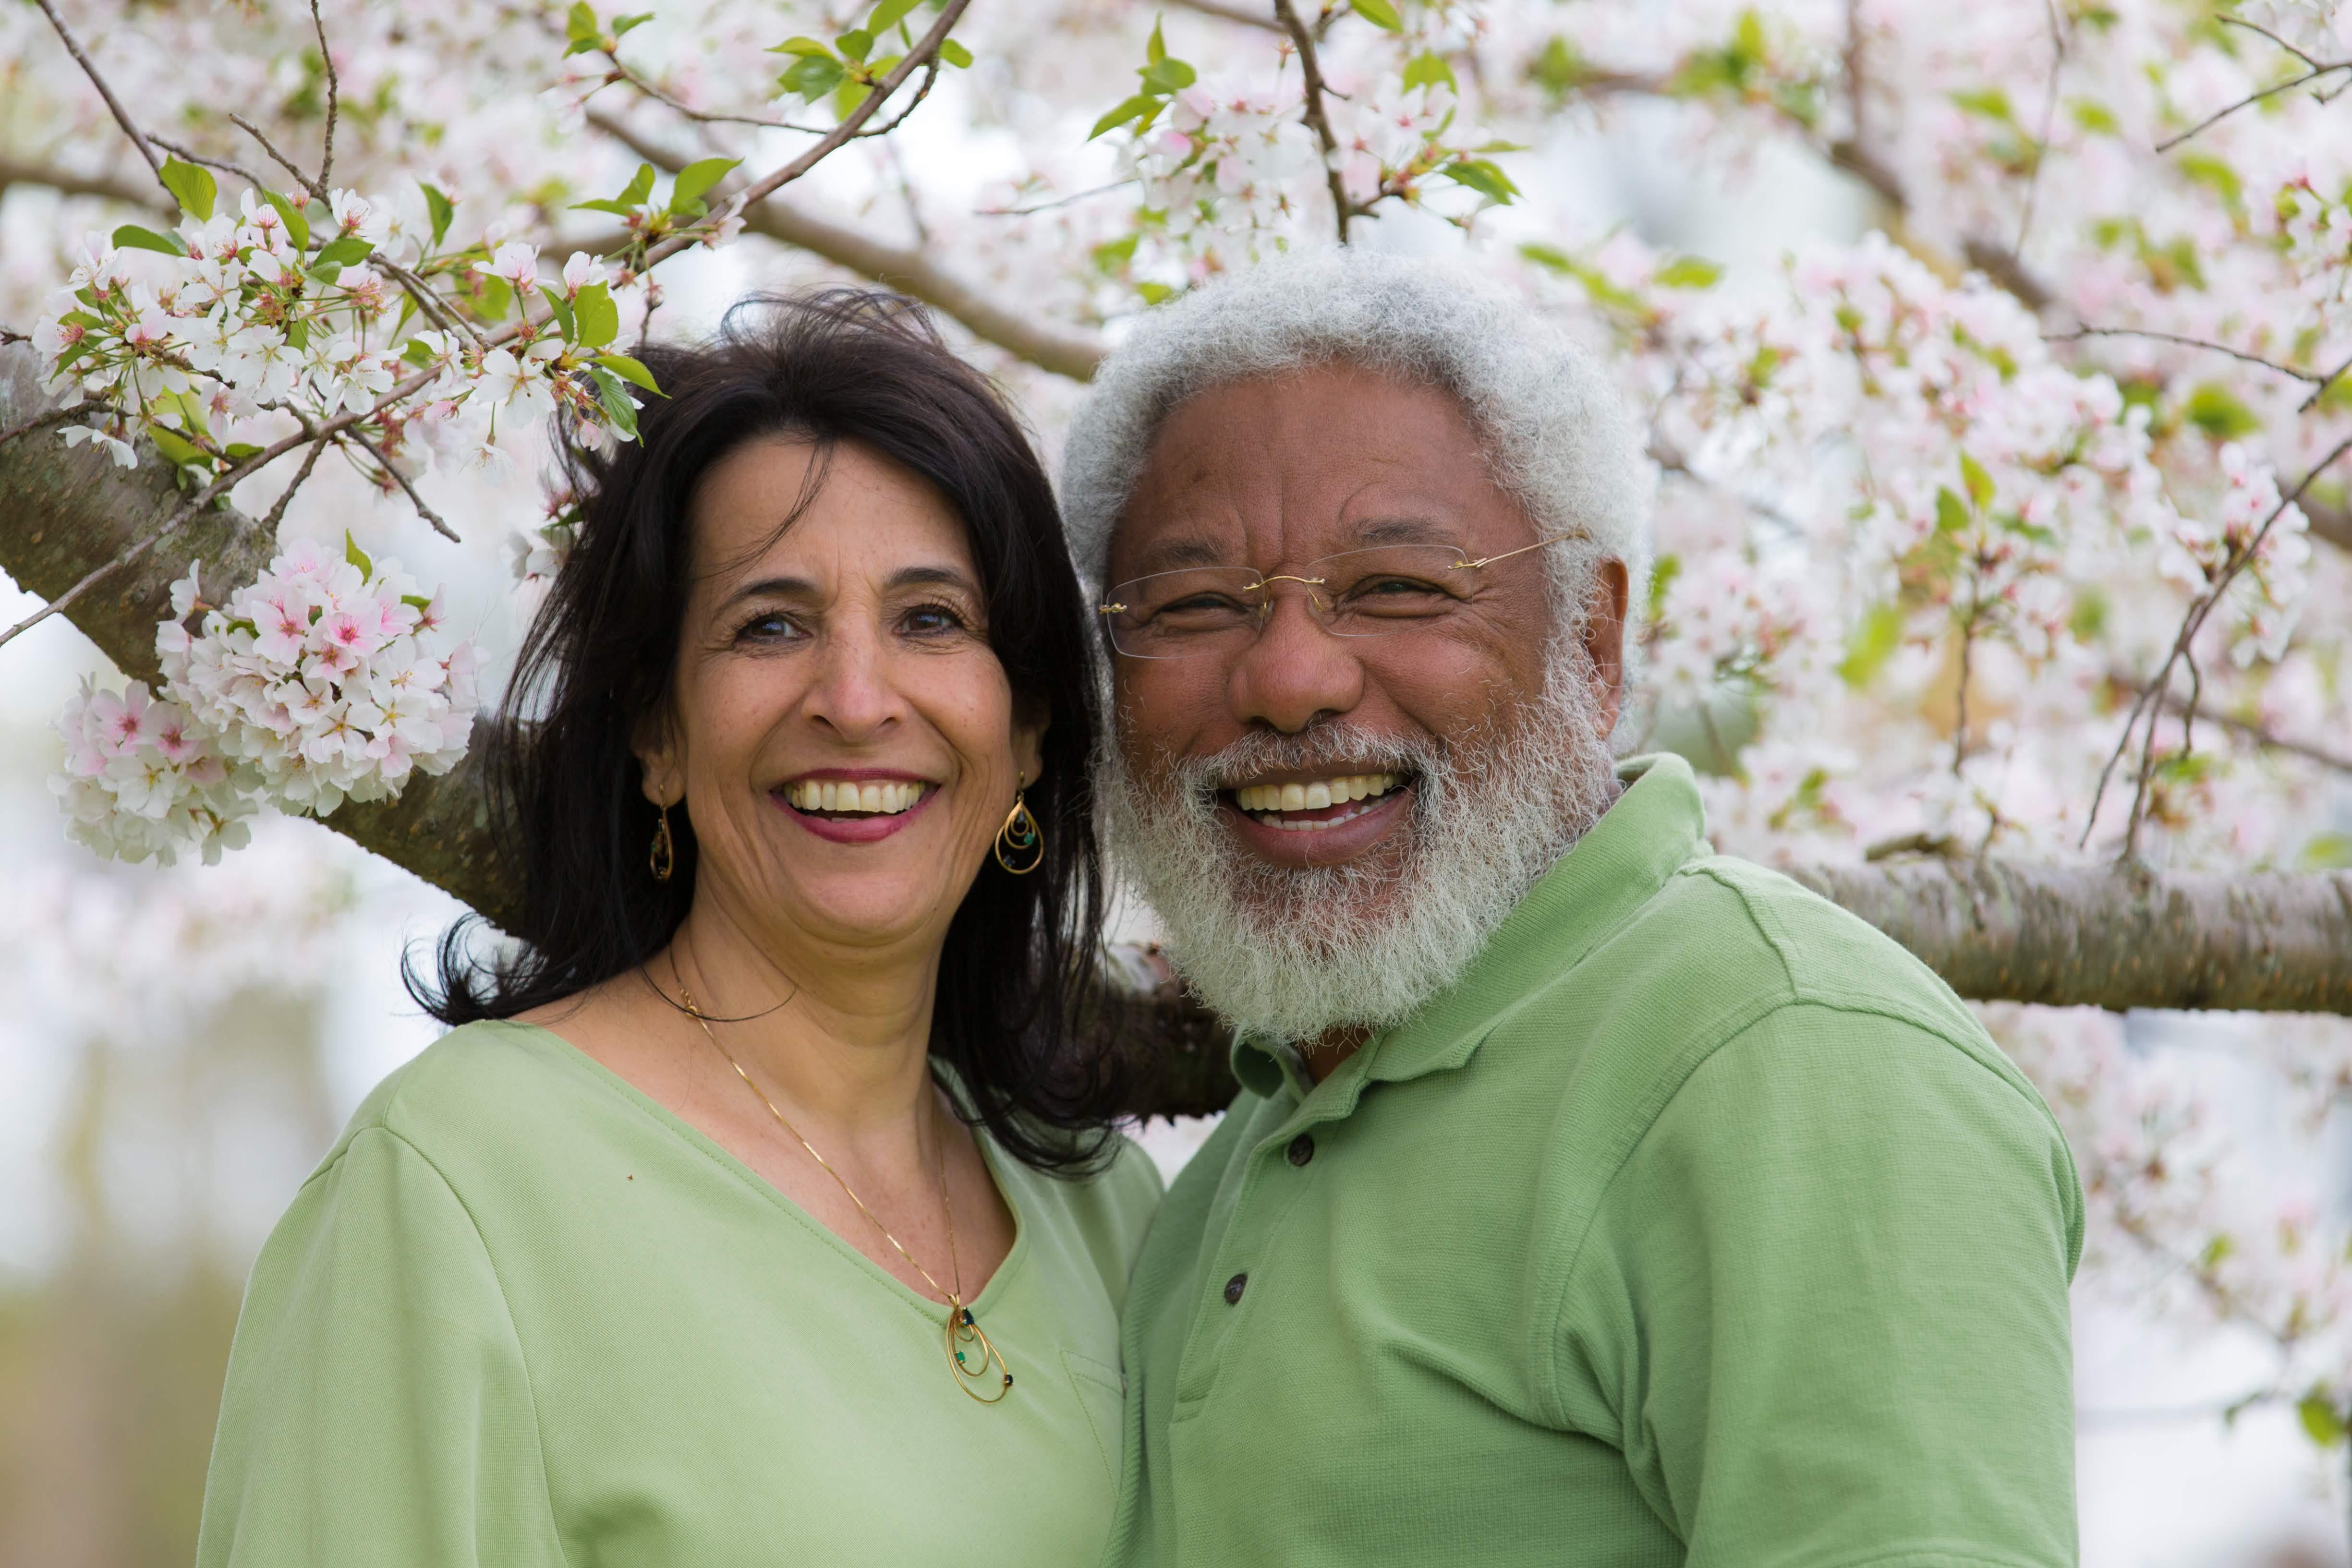 John and Chantal Brooks